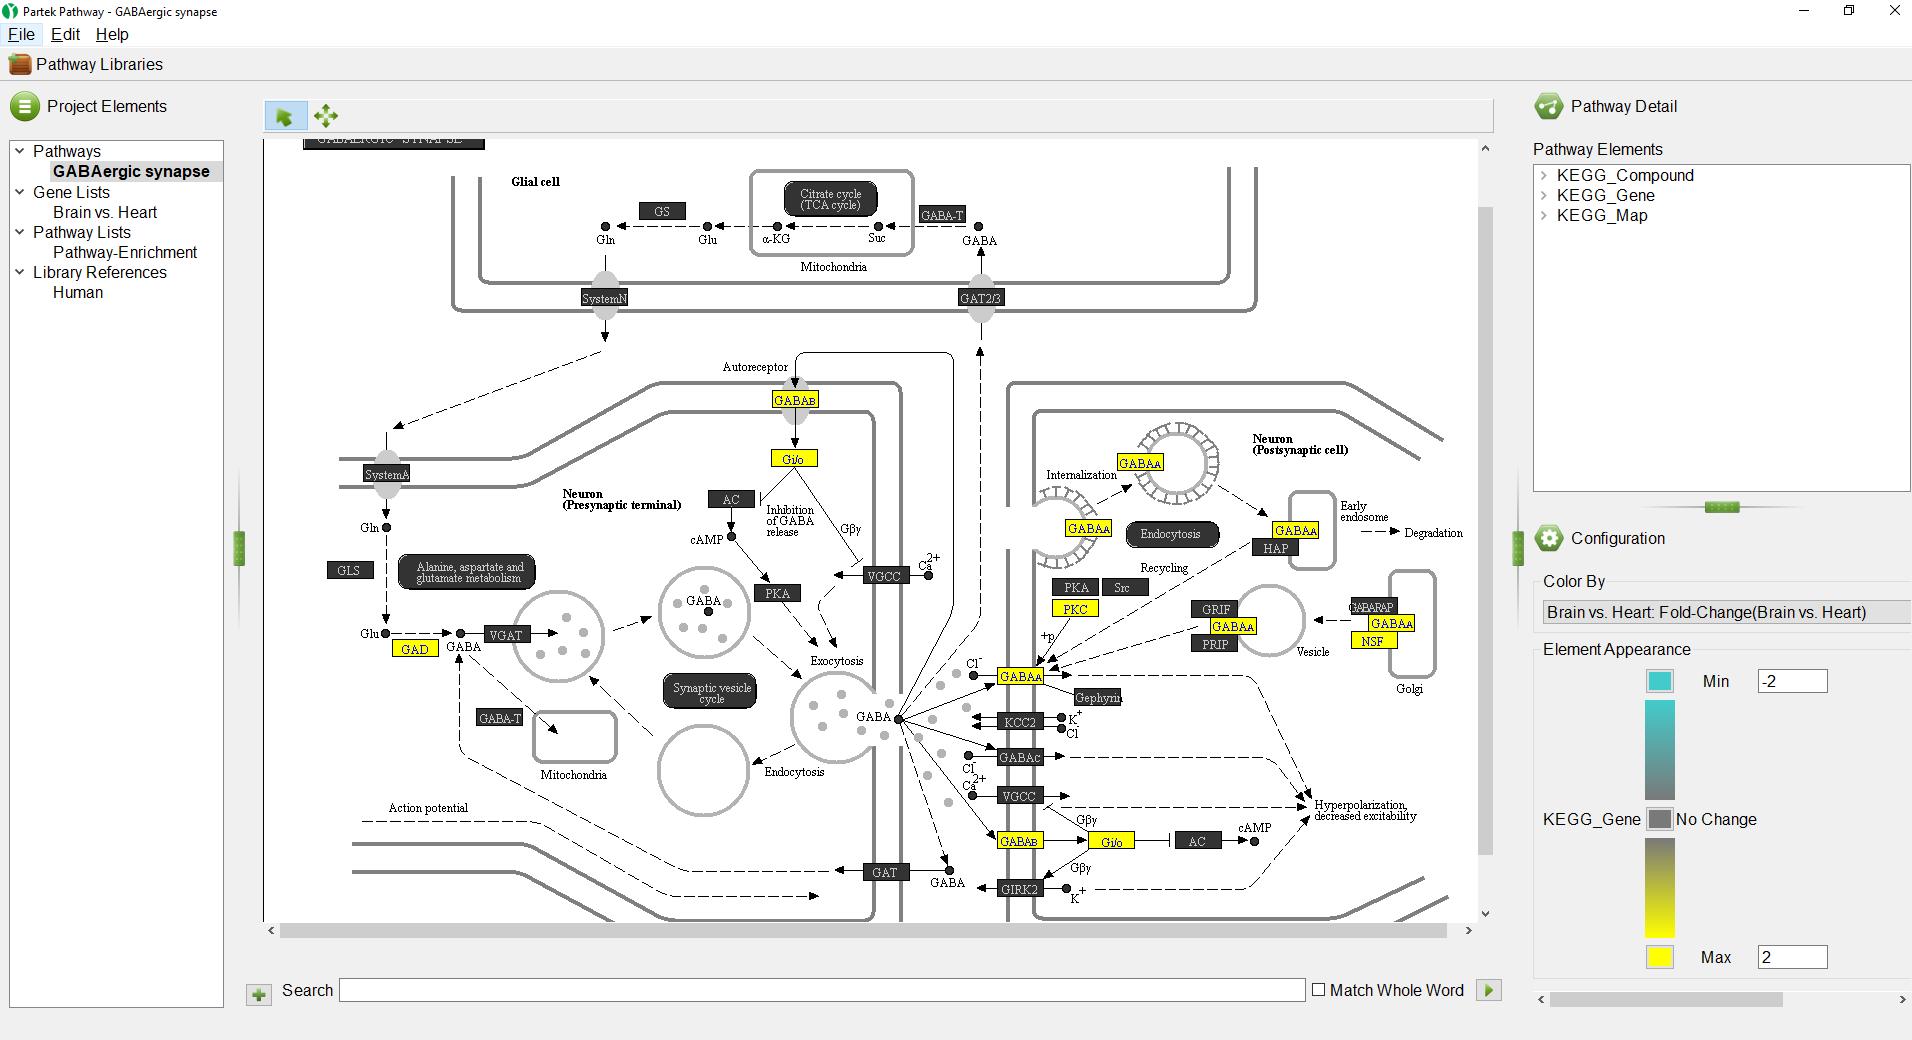 analyzing pathway enrichment in partek pathway - genomics suite documentation